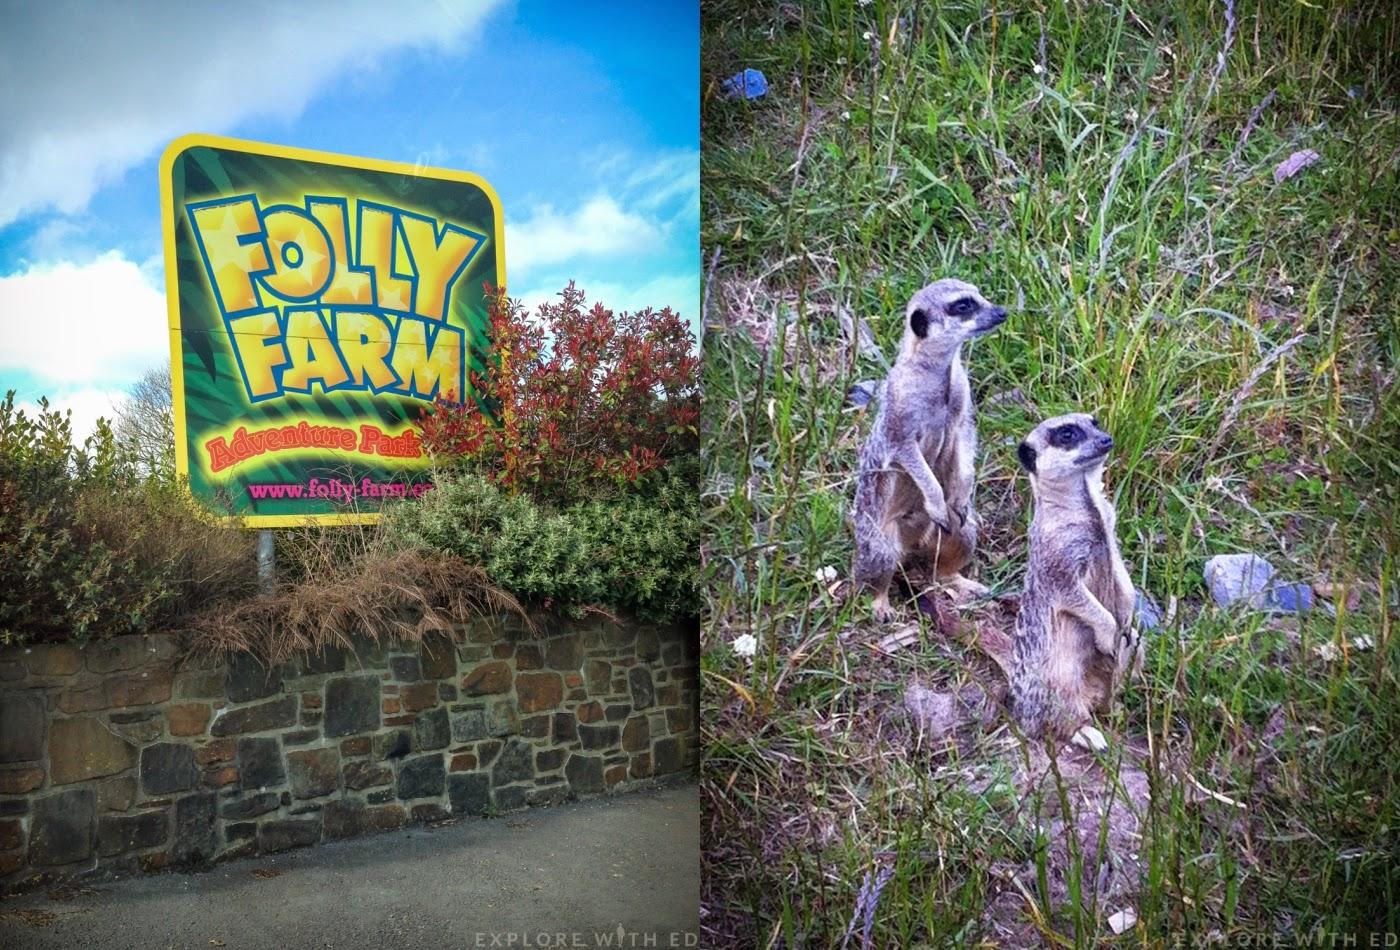 Folly Farm in West Wales